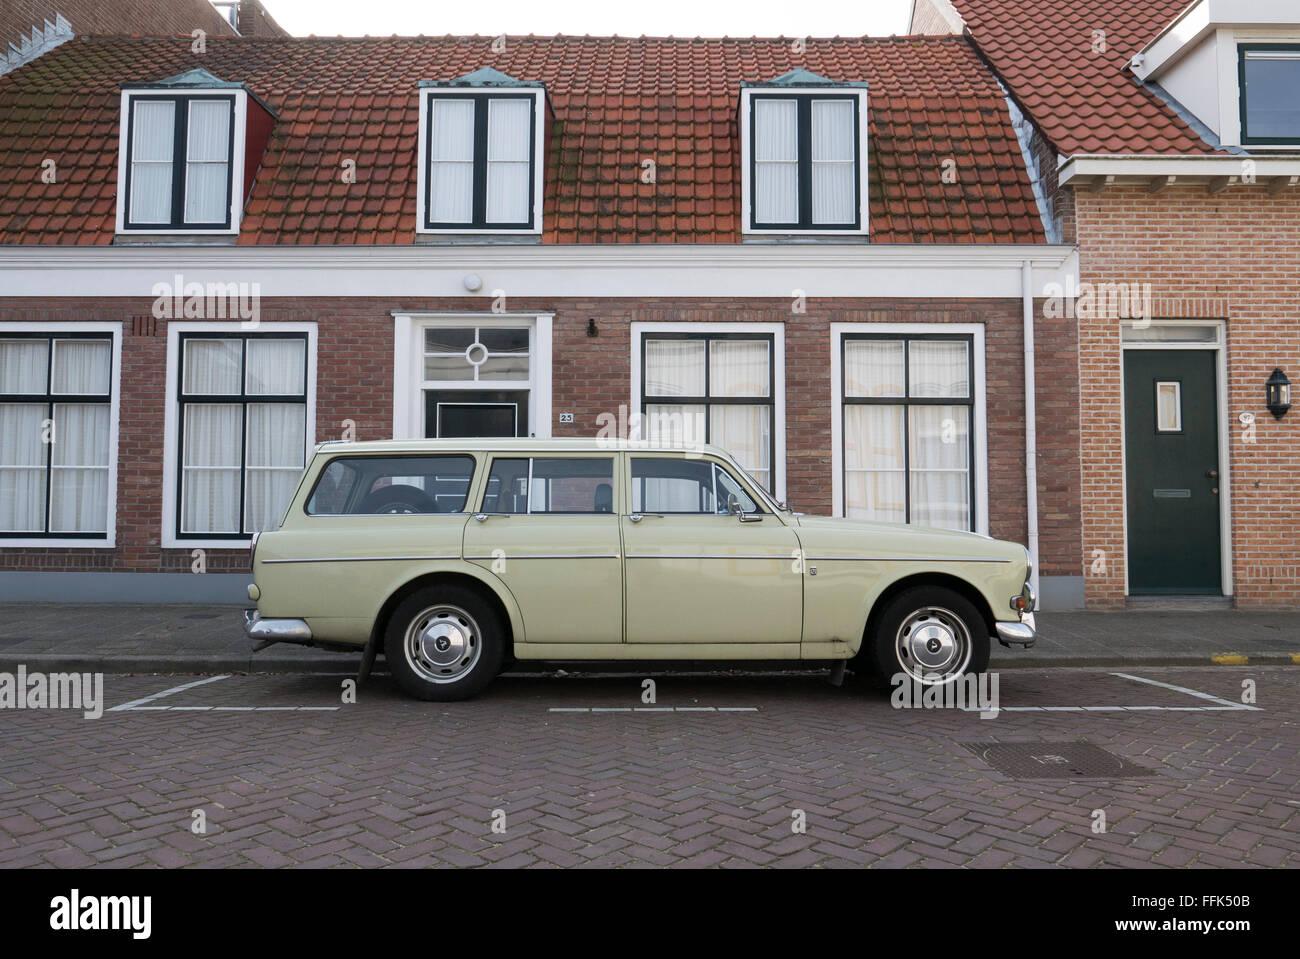 Volvo Oldtimer, Domburg, Nordseeküste, Zeeland, Niederlande Stockbild